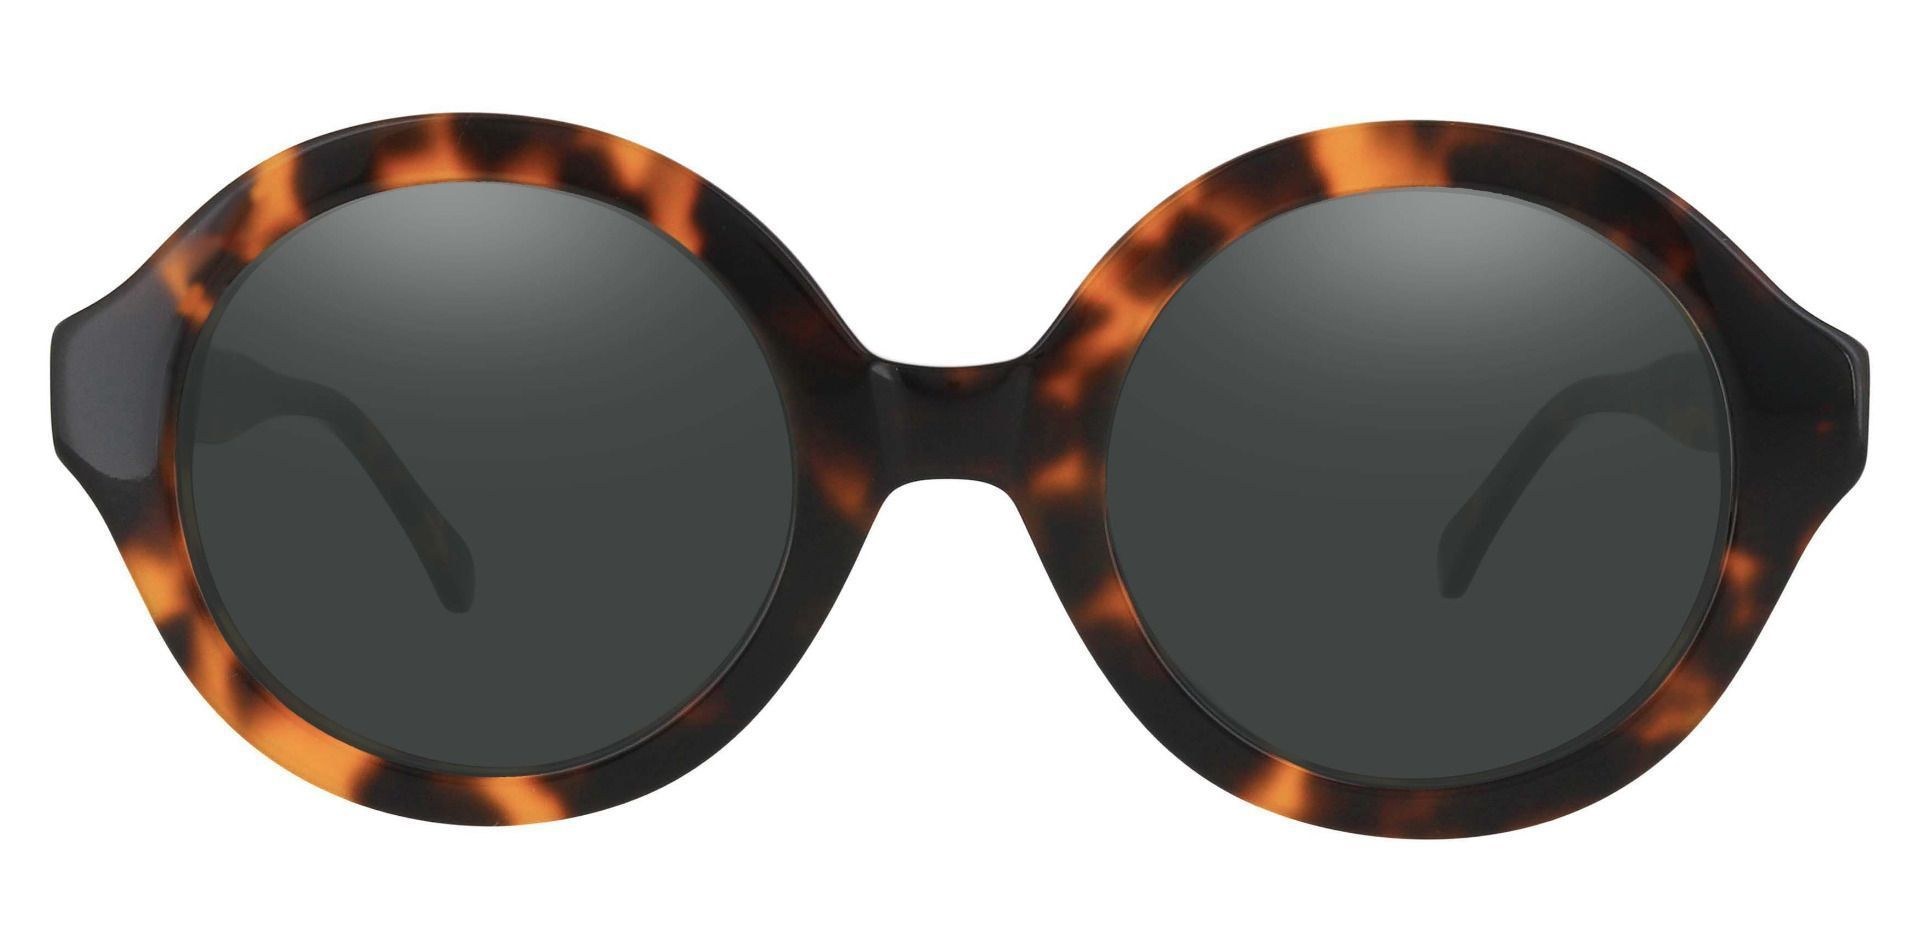 Clara Round Prescription Sunglasses - Tortoise Frame With Gray Lenses